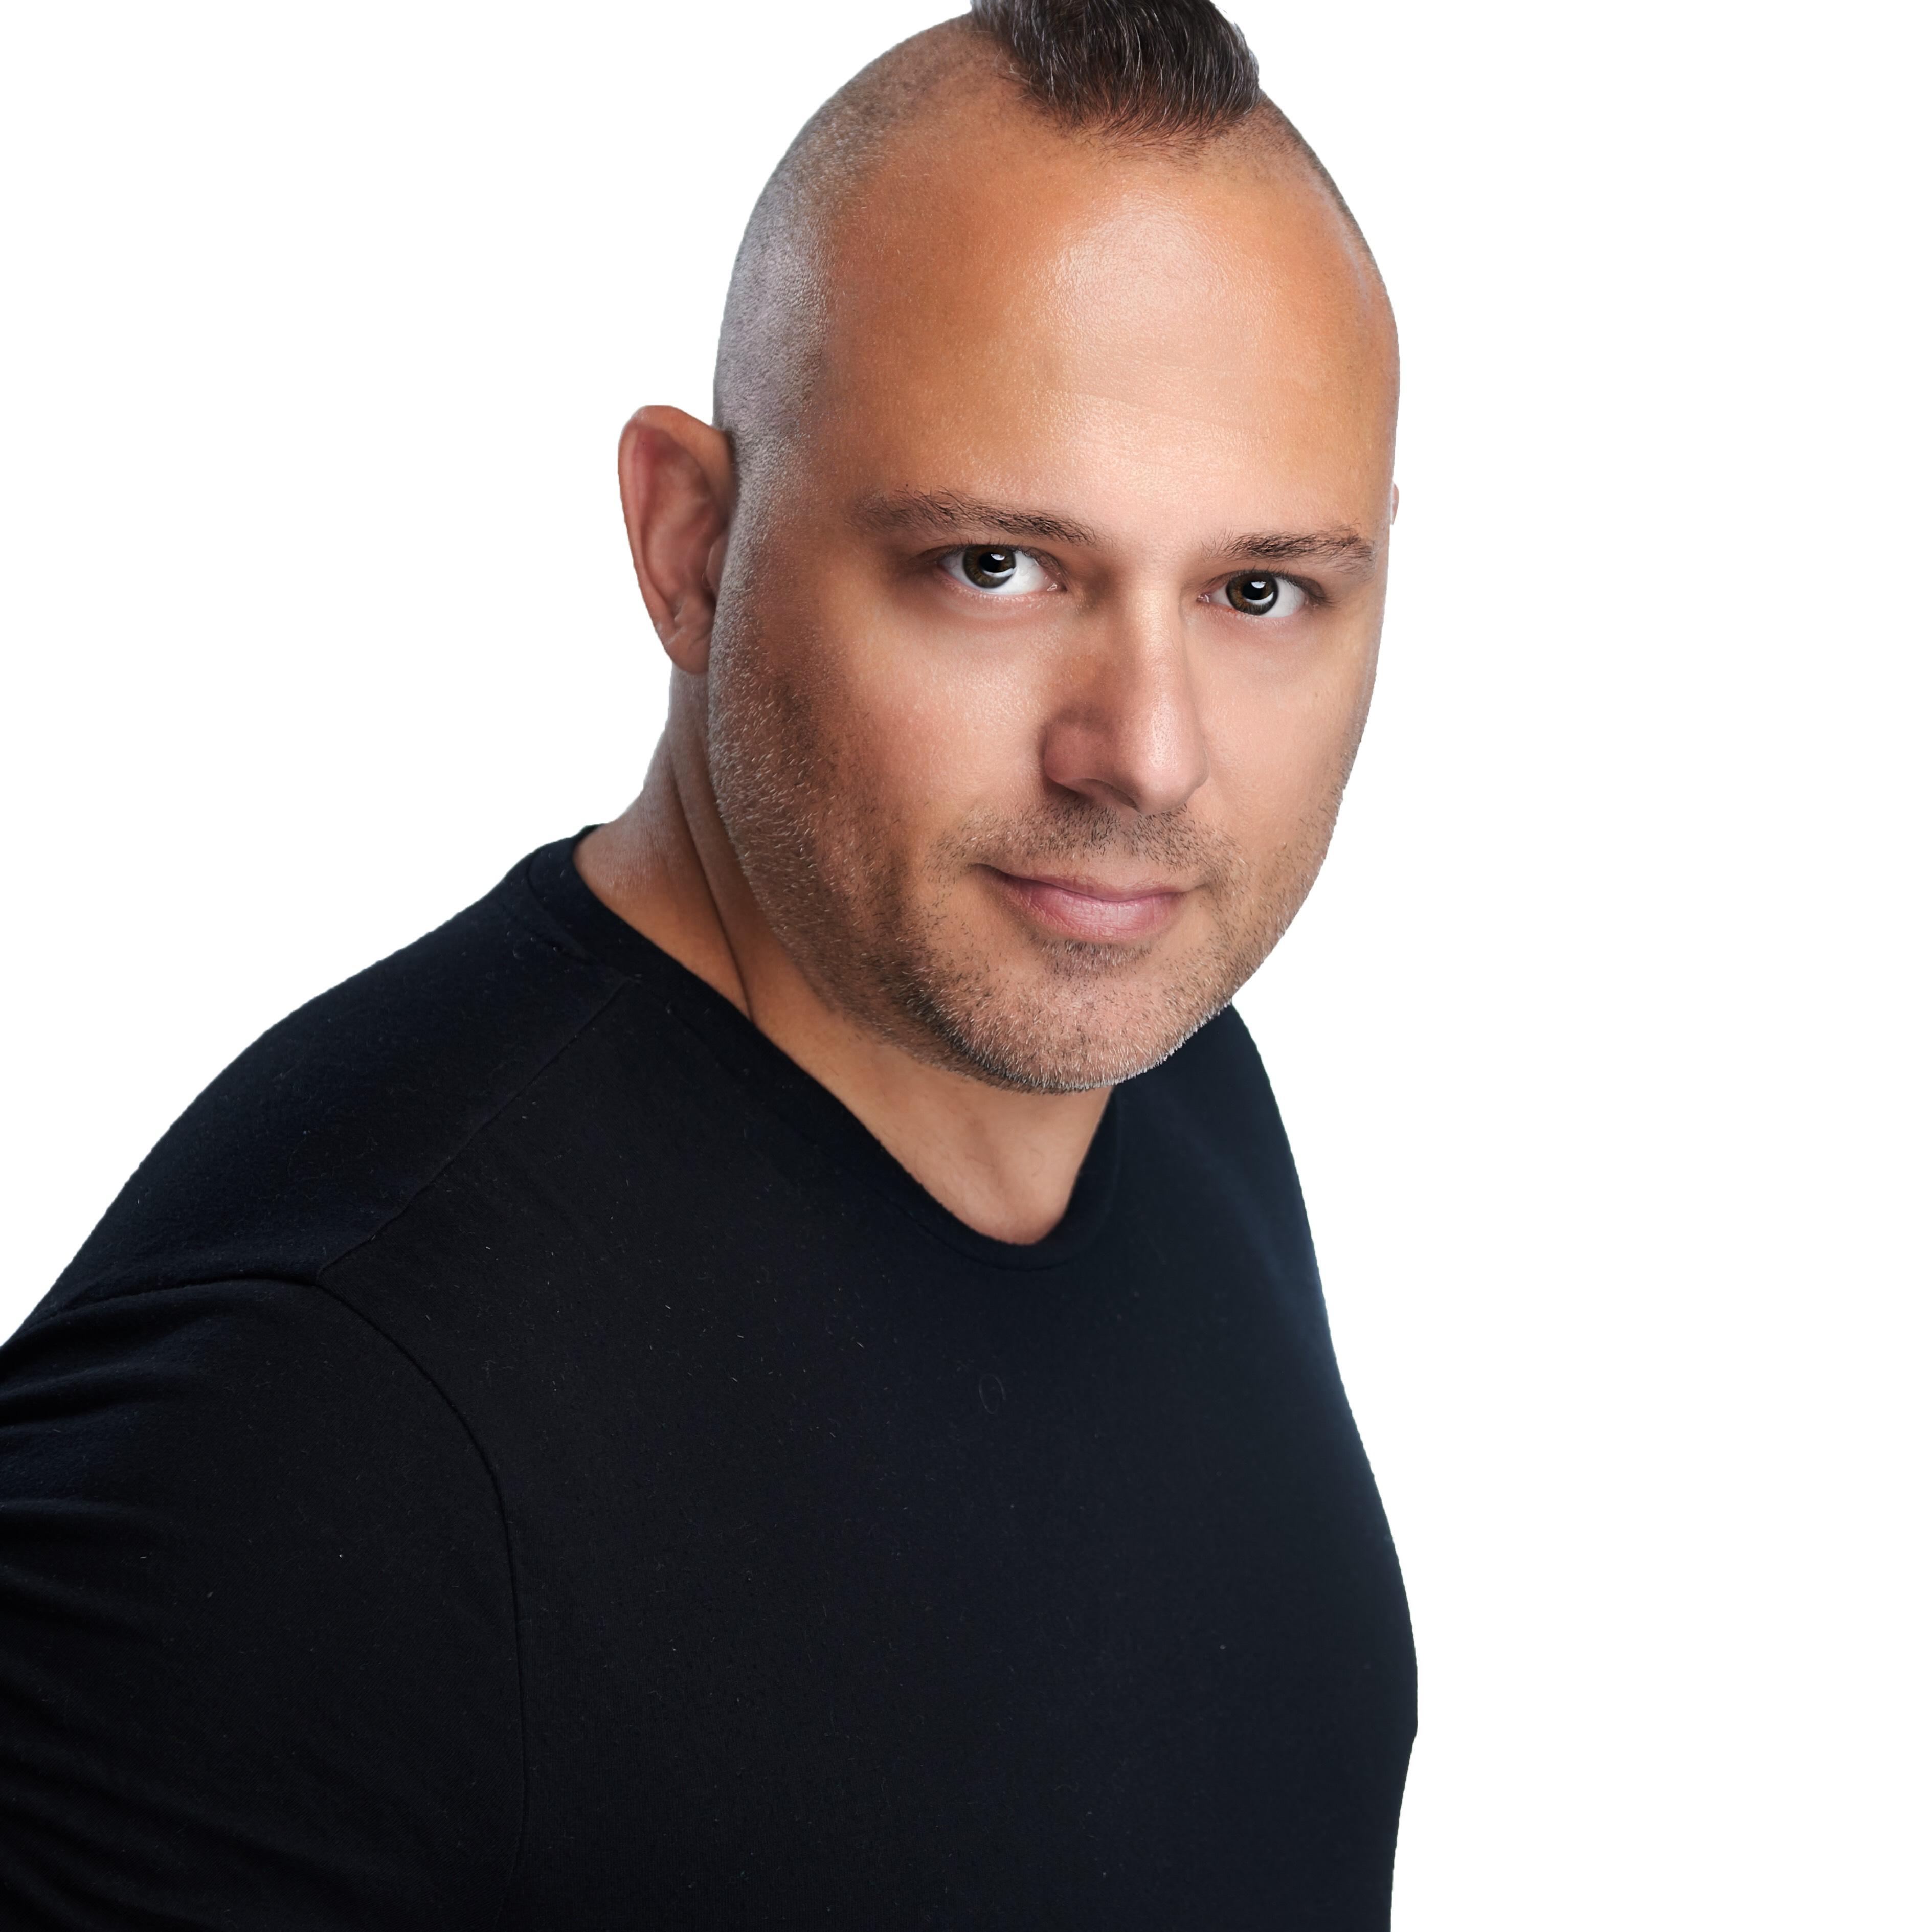 Michael Ciurleo